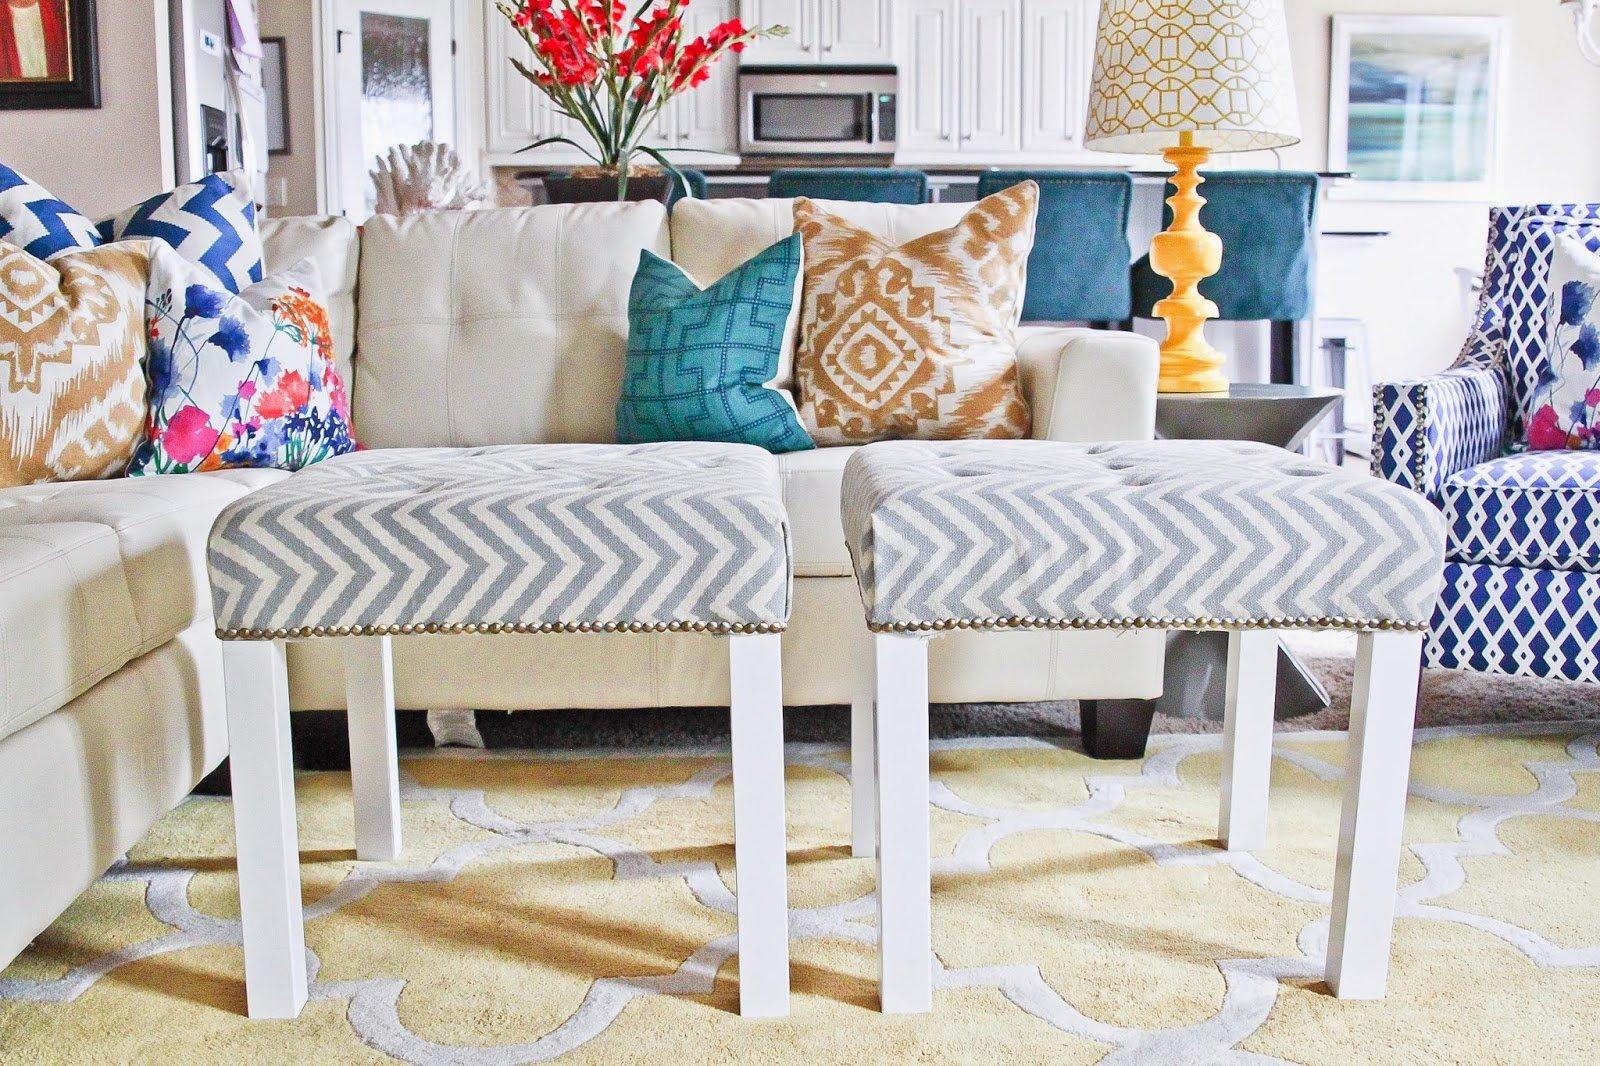 Remodelaholic From Bargain To Beautiful 29 Stylish Ikea